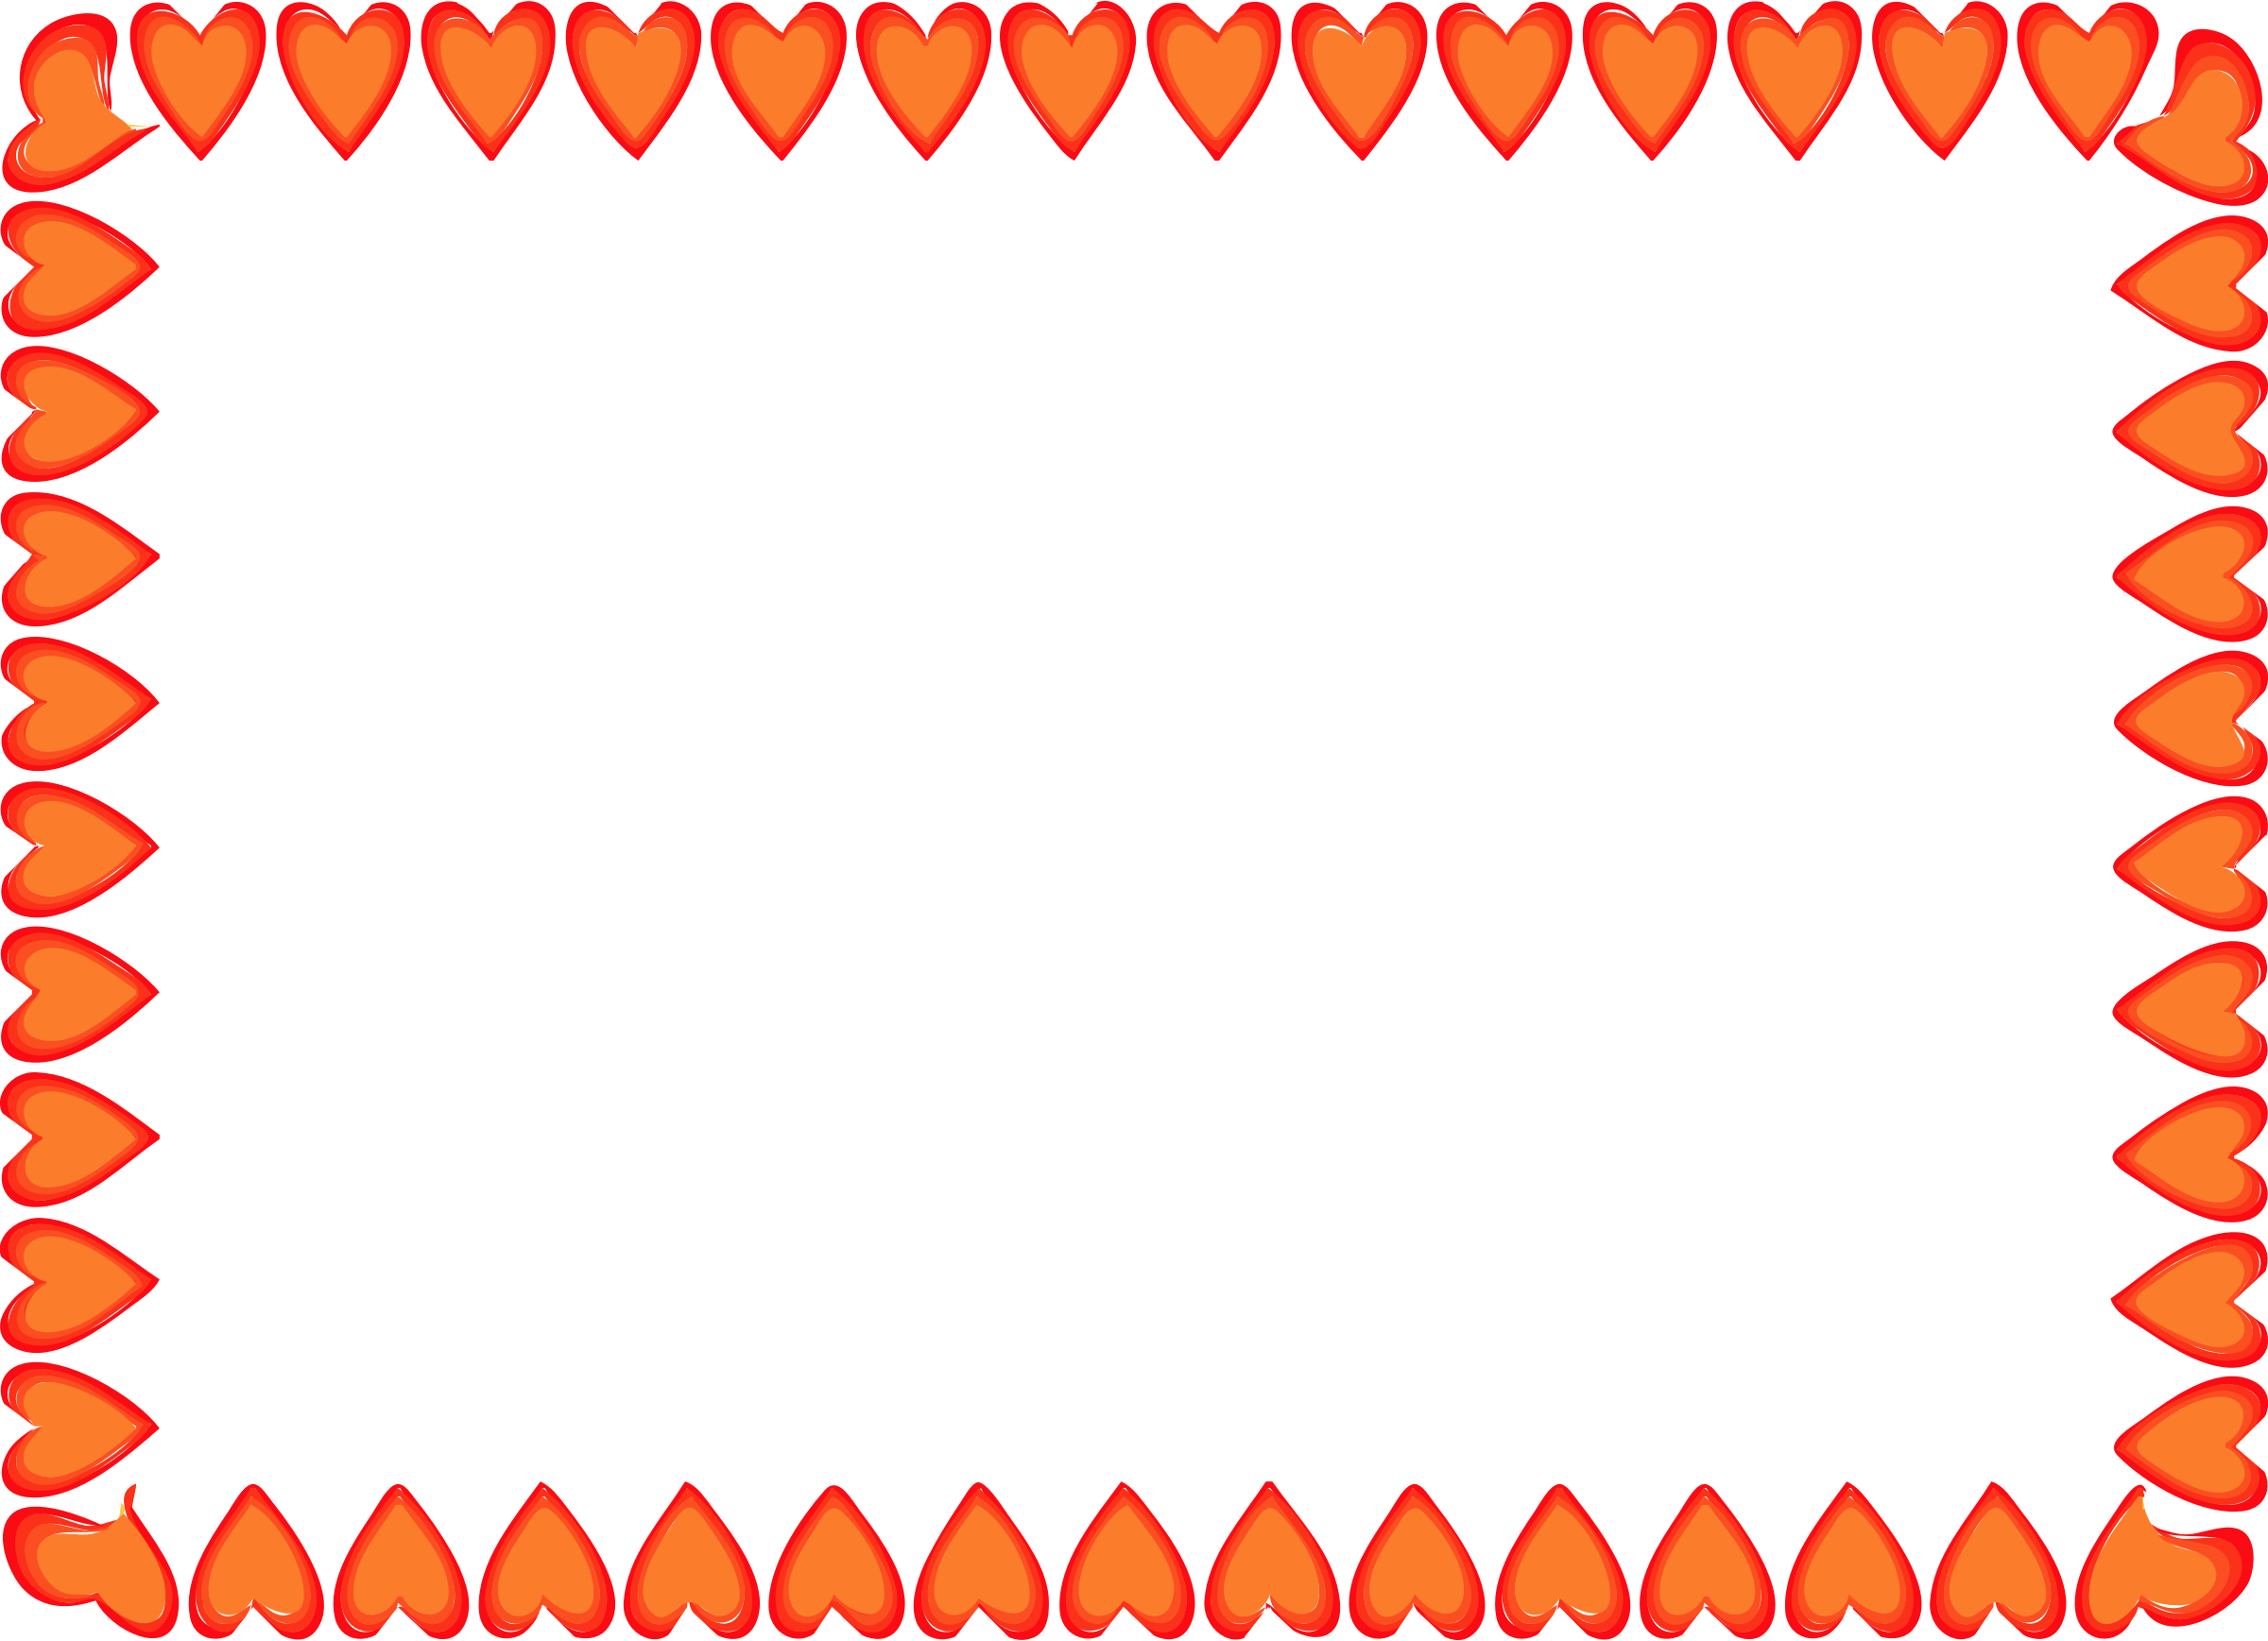 Heart border clipart red hearts border